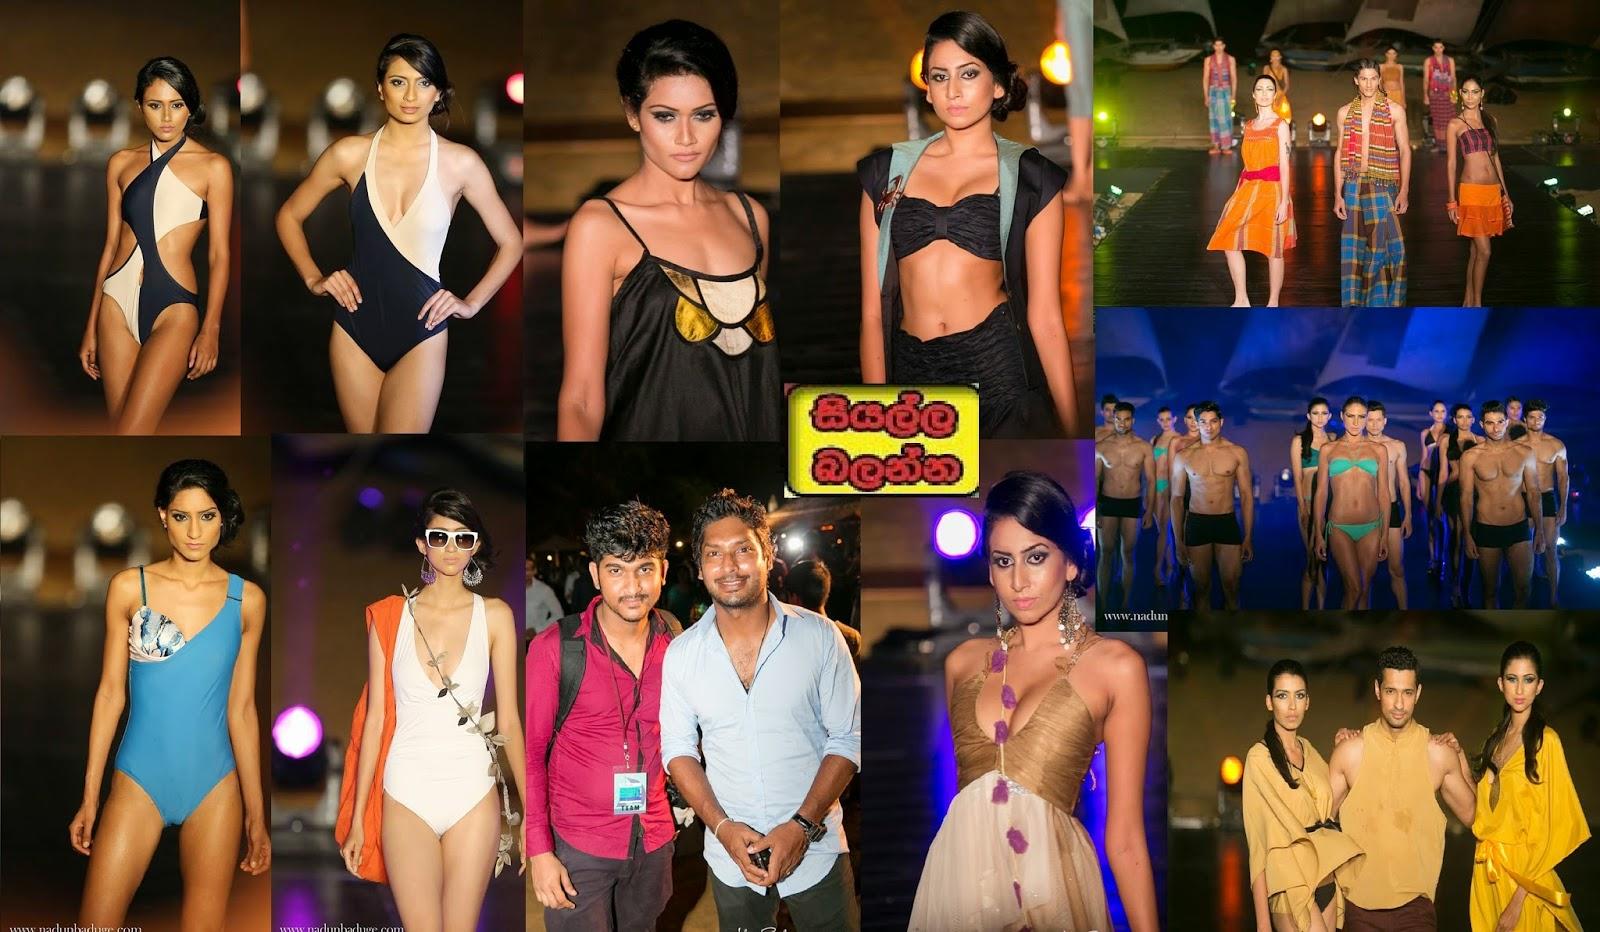 http://picture.gossiplankahotnews.com/2014/10/hsbc-cfw-resort-show-2014.html